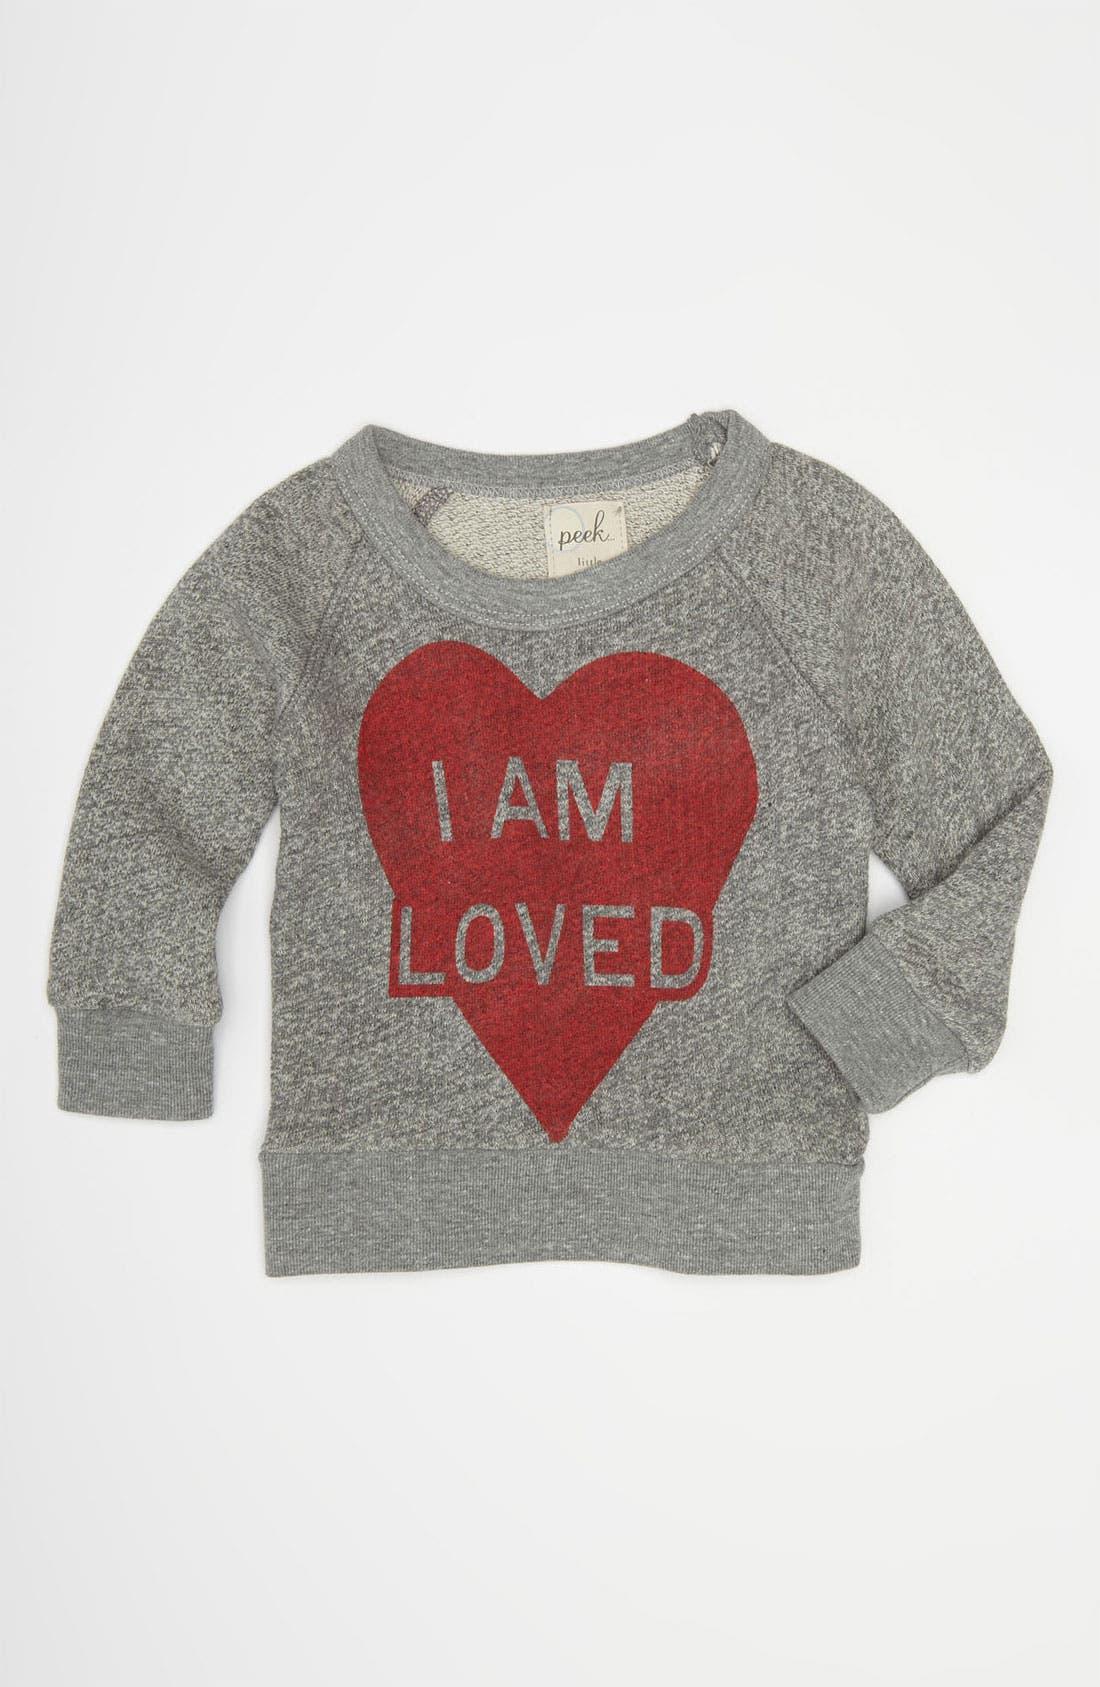 Alternate Image 1 Selected - Peek 'I Am Loved' Sweater (Infant)